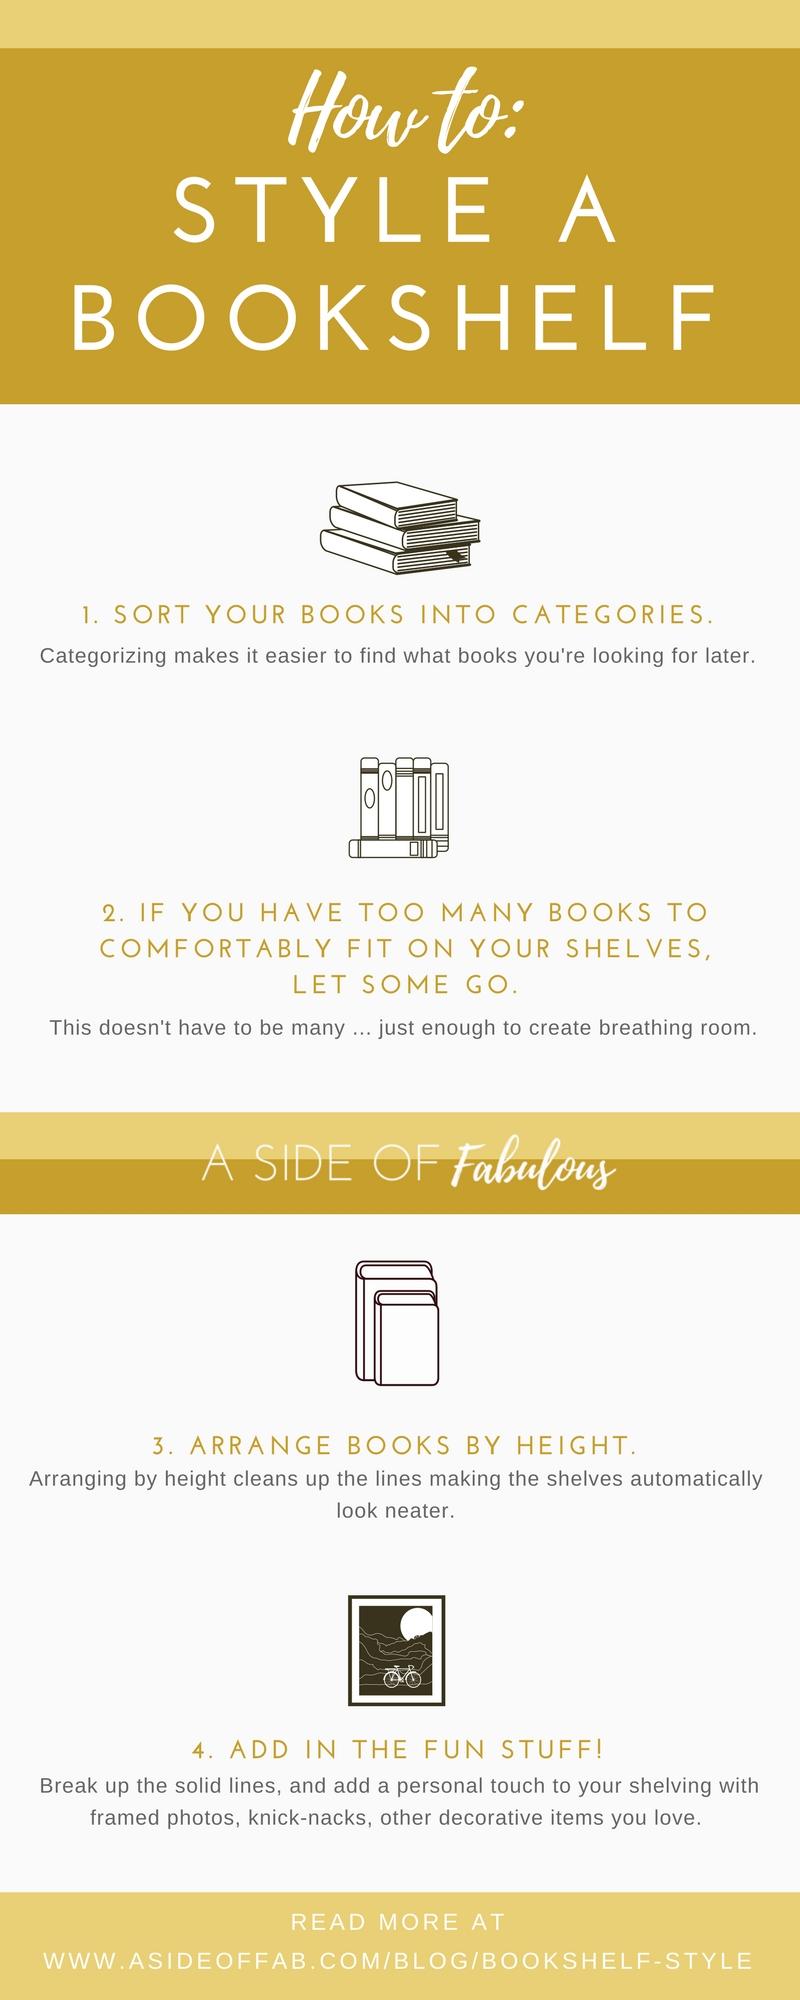 Bookshelf Styling Infographic.jpg